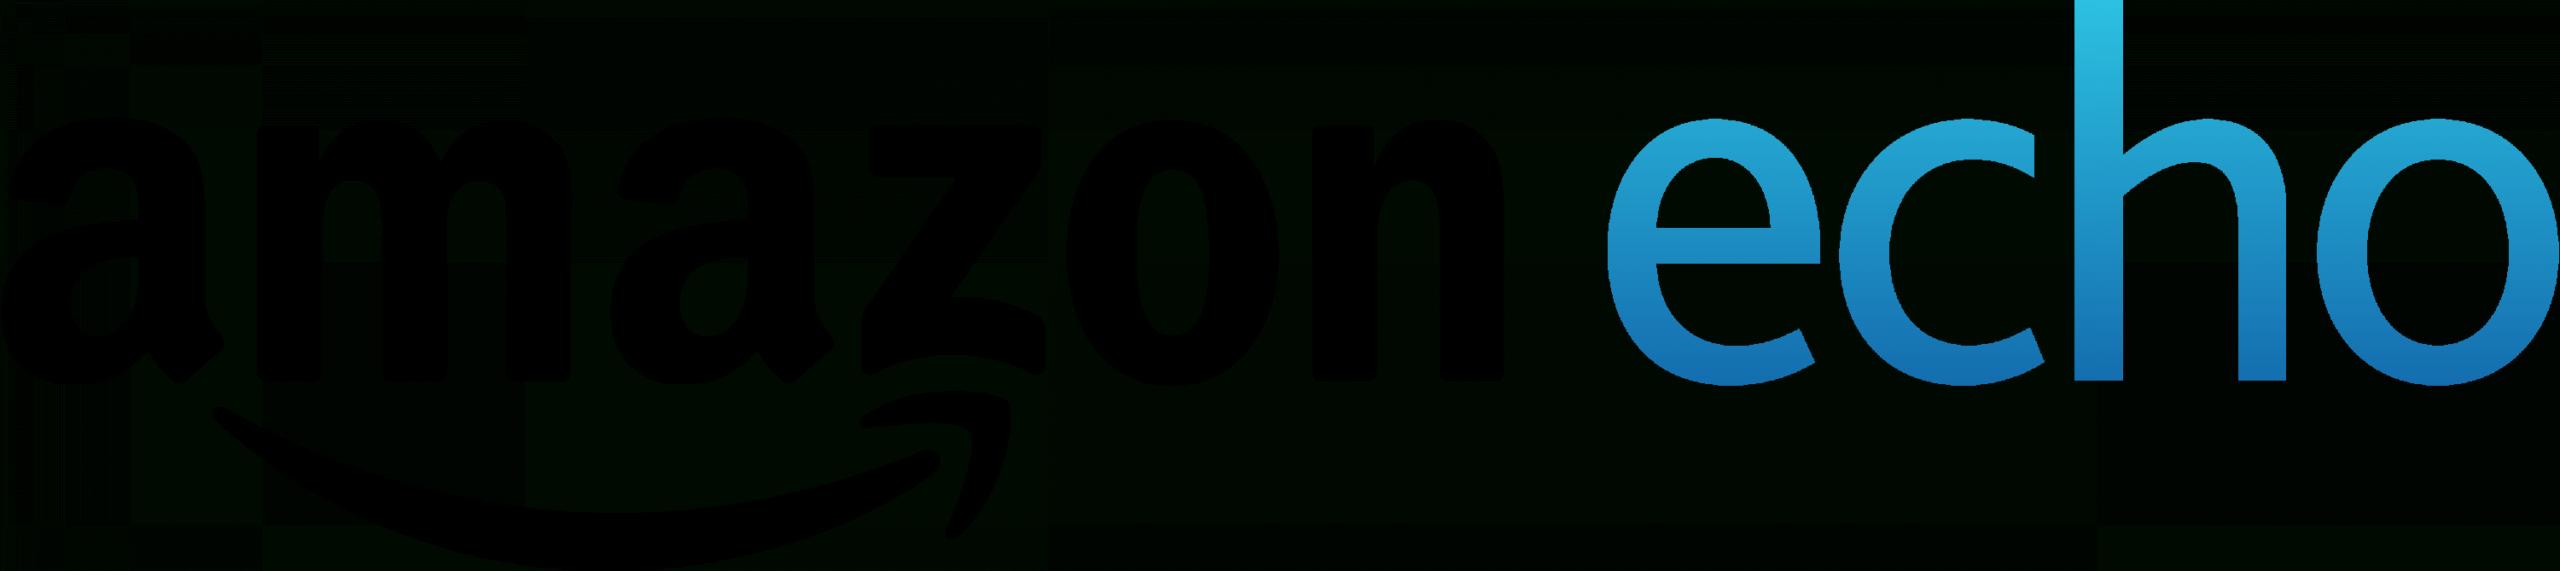 12+ Amazon Echo Logo Png in 2020 Logo images, Amazon